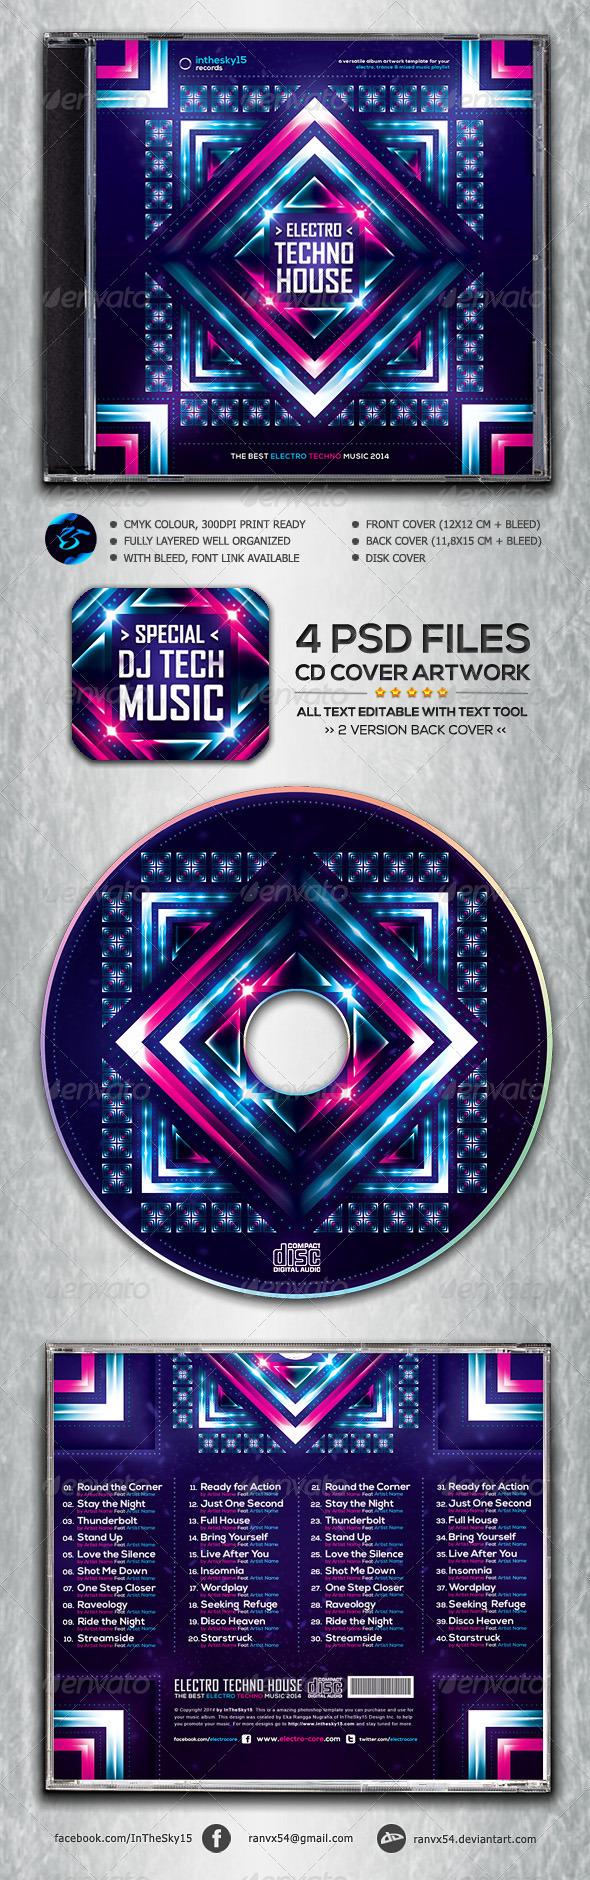 Electro Techno House CD Album Artwork - CD & DVD Artwork Print Templates